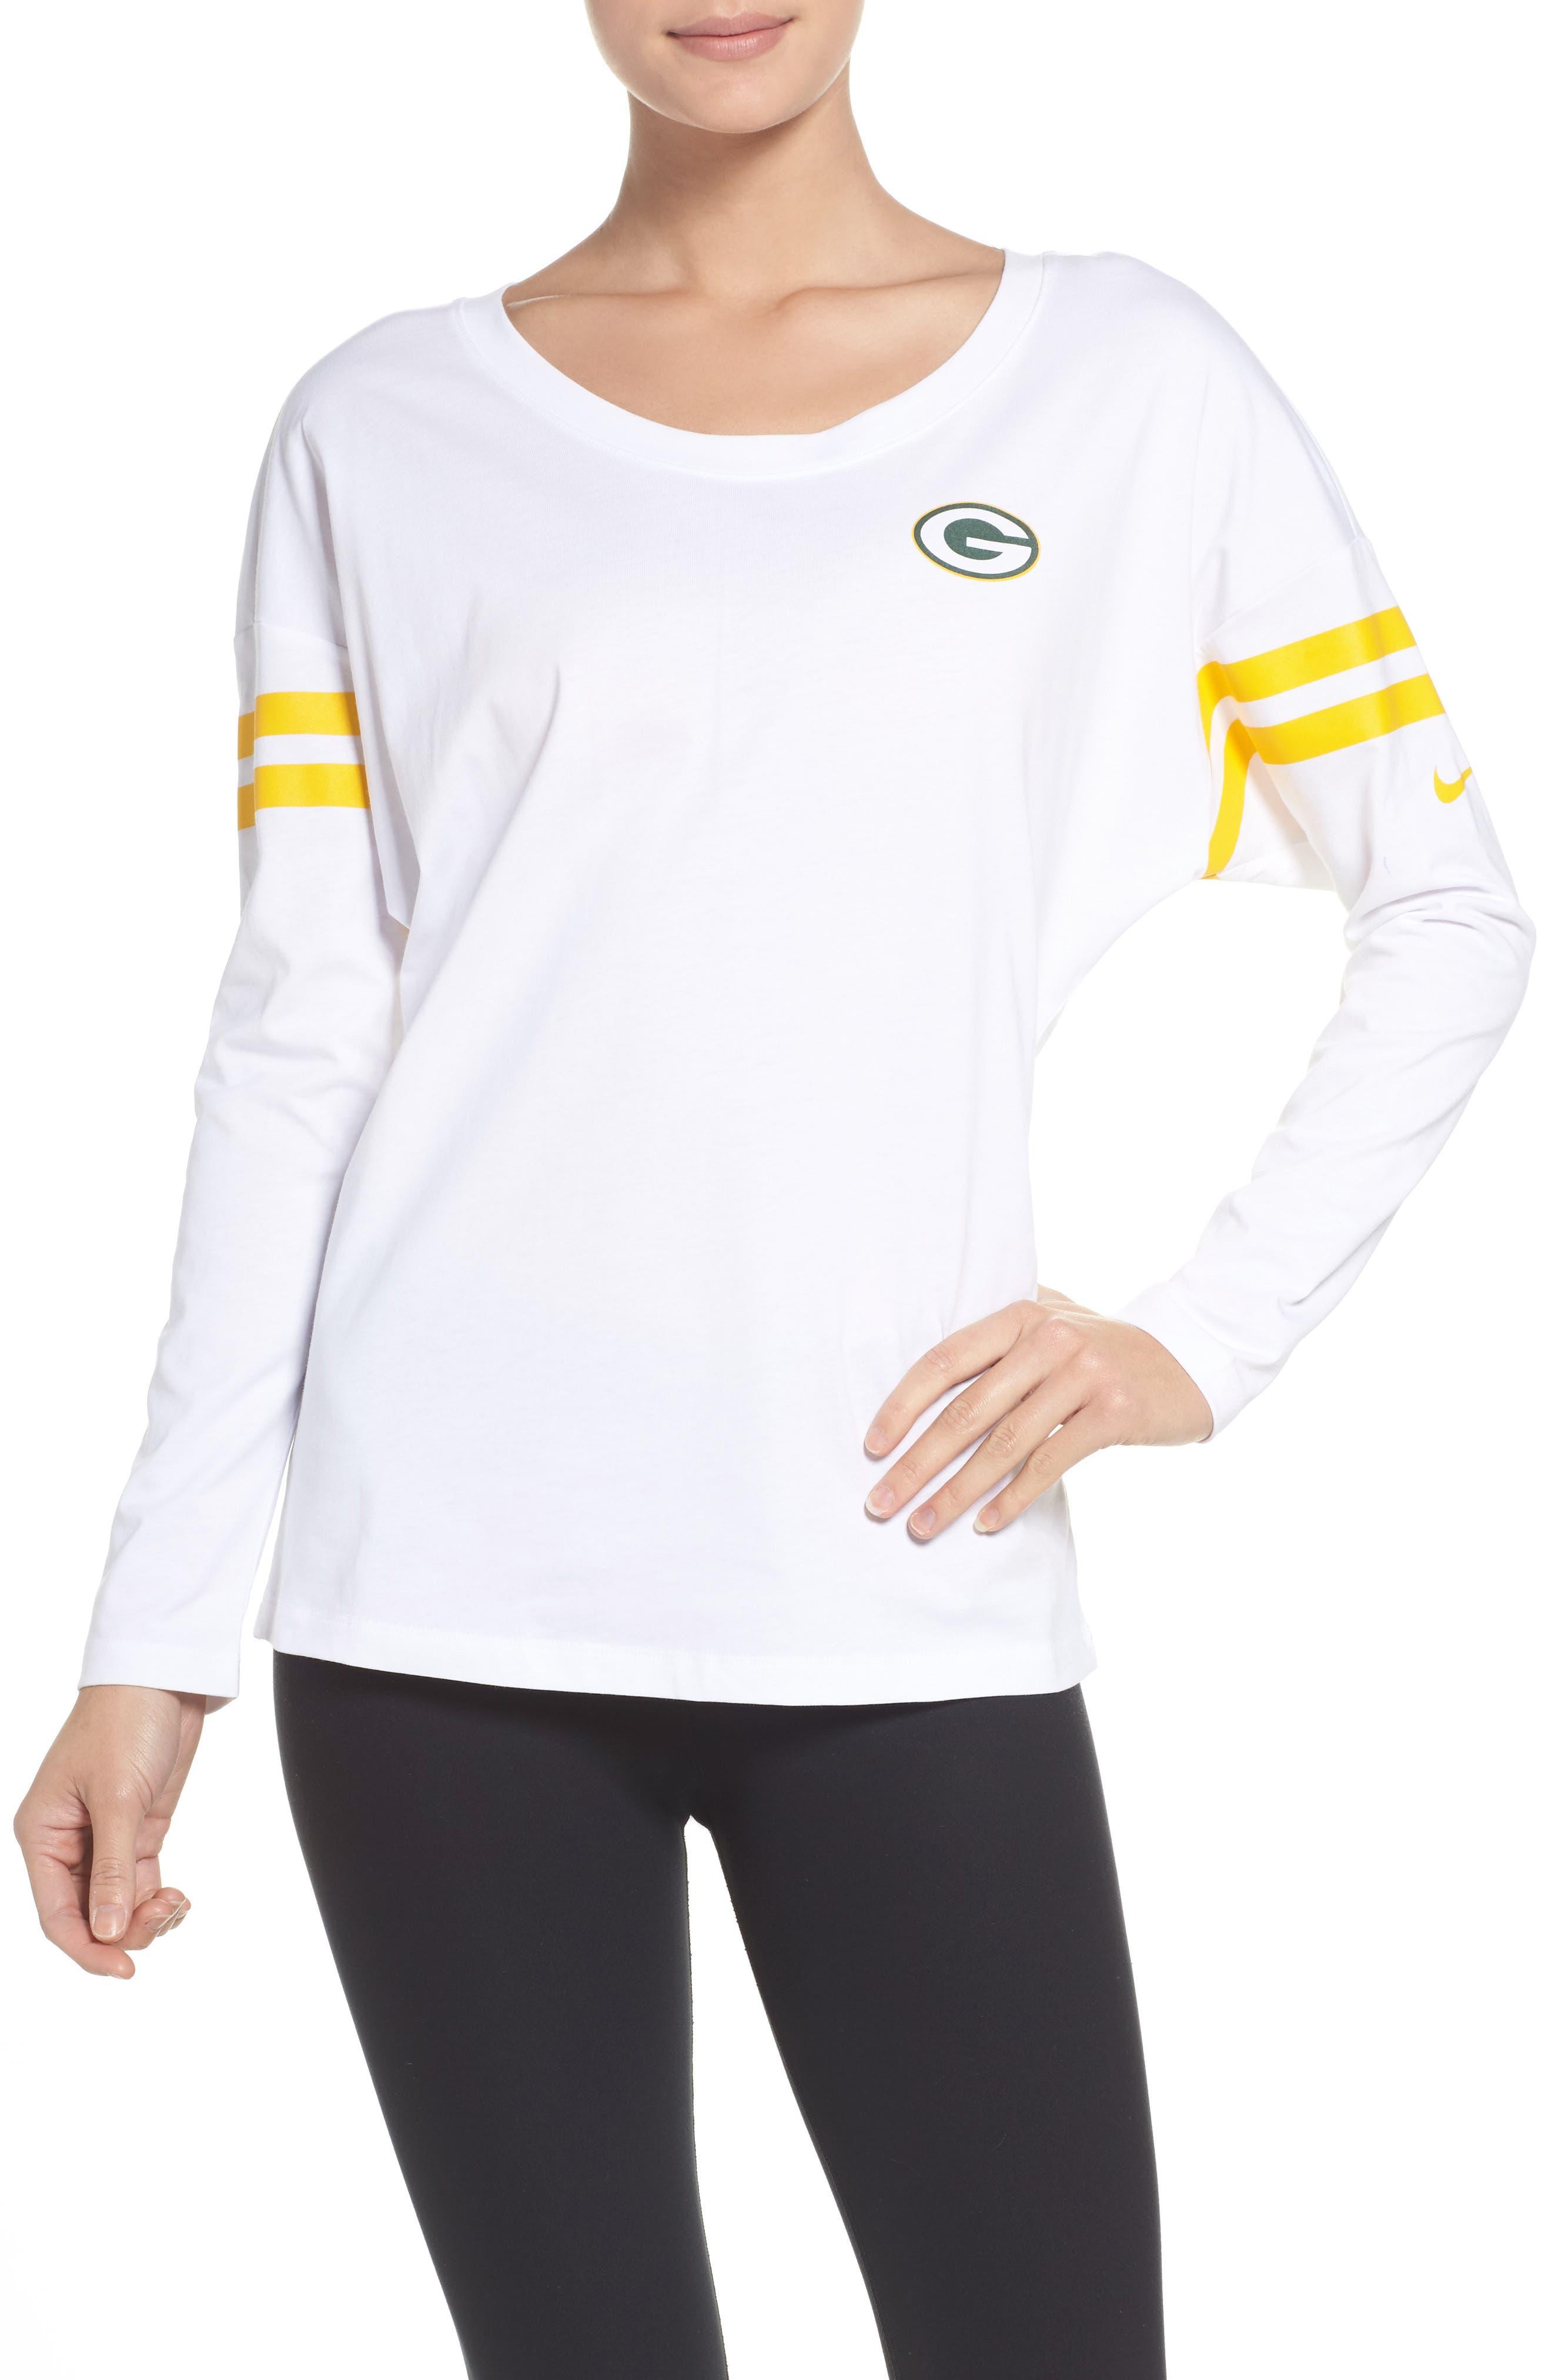 Main Image - Nike NFL Tailgate Tee